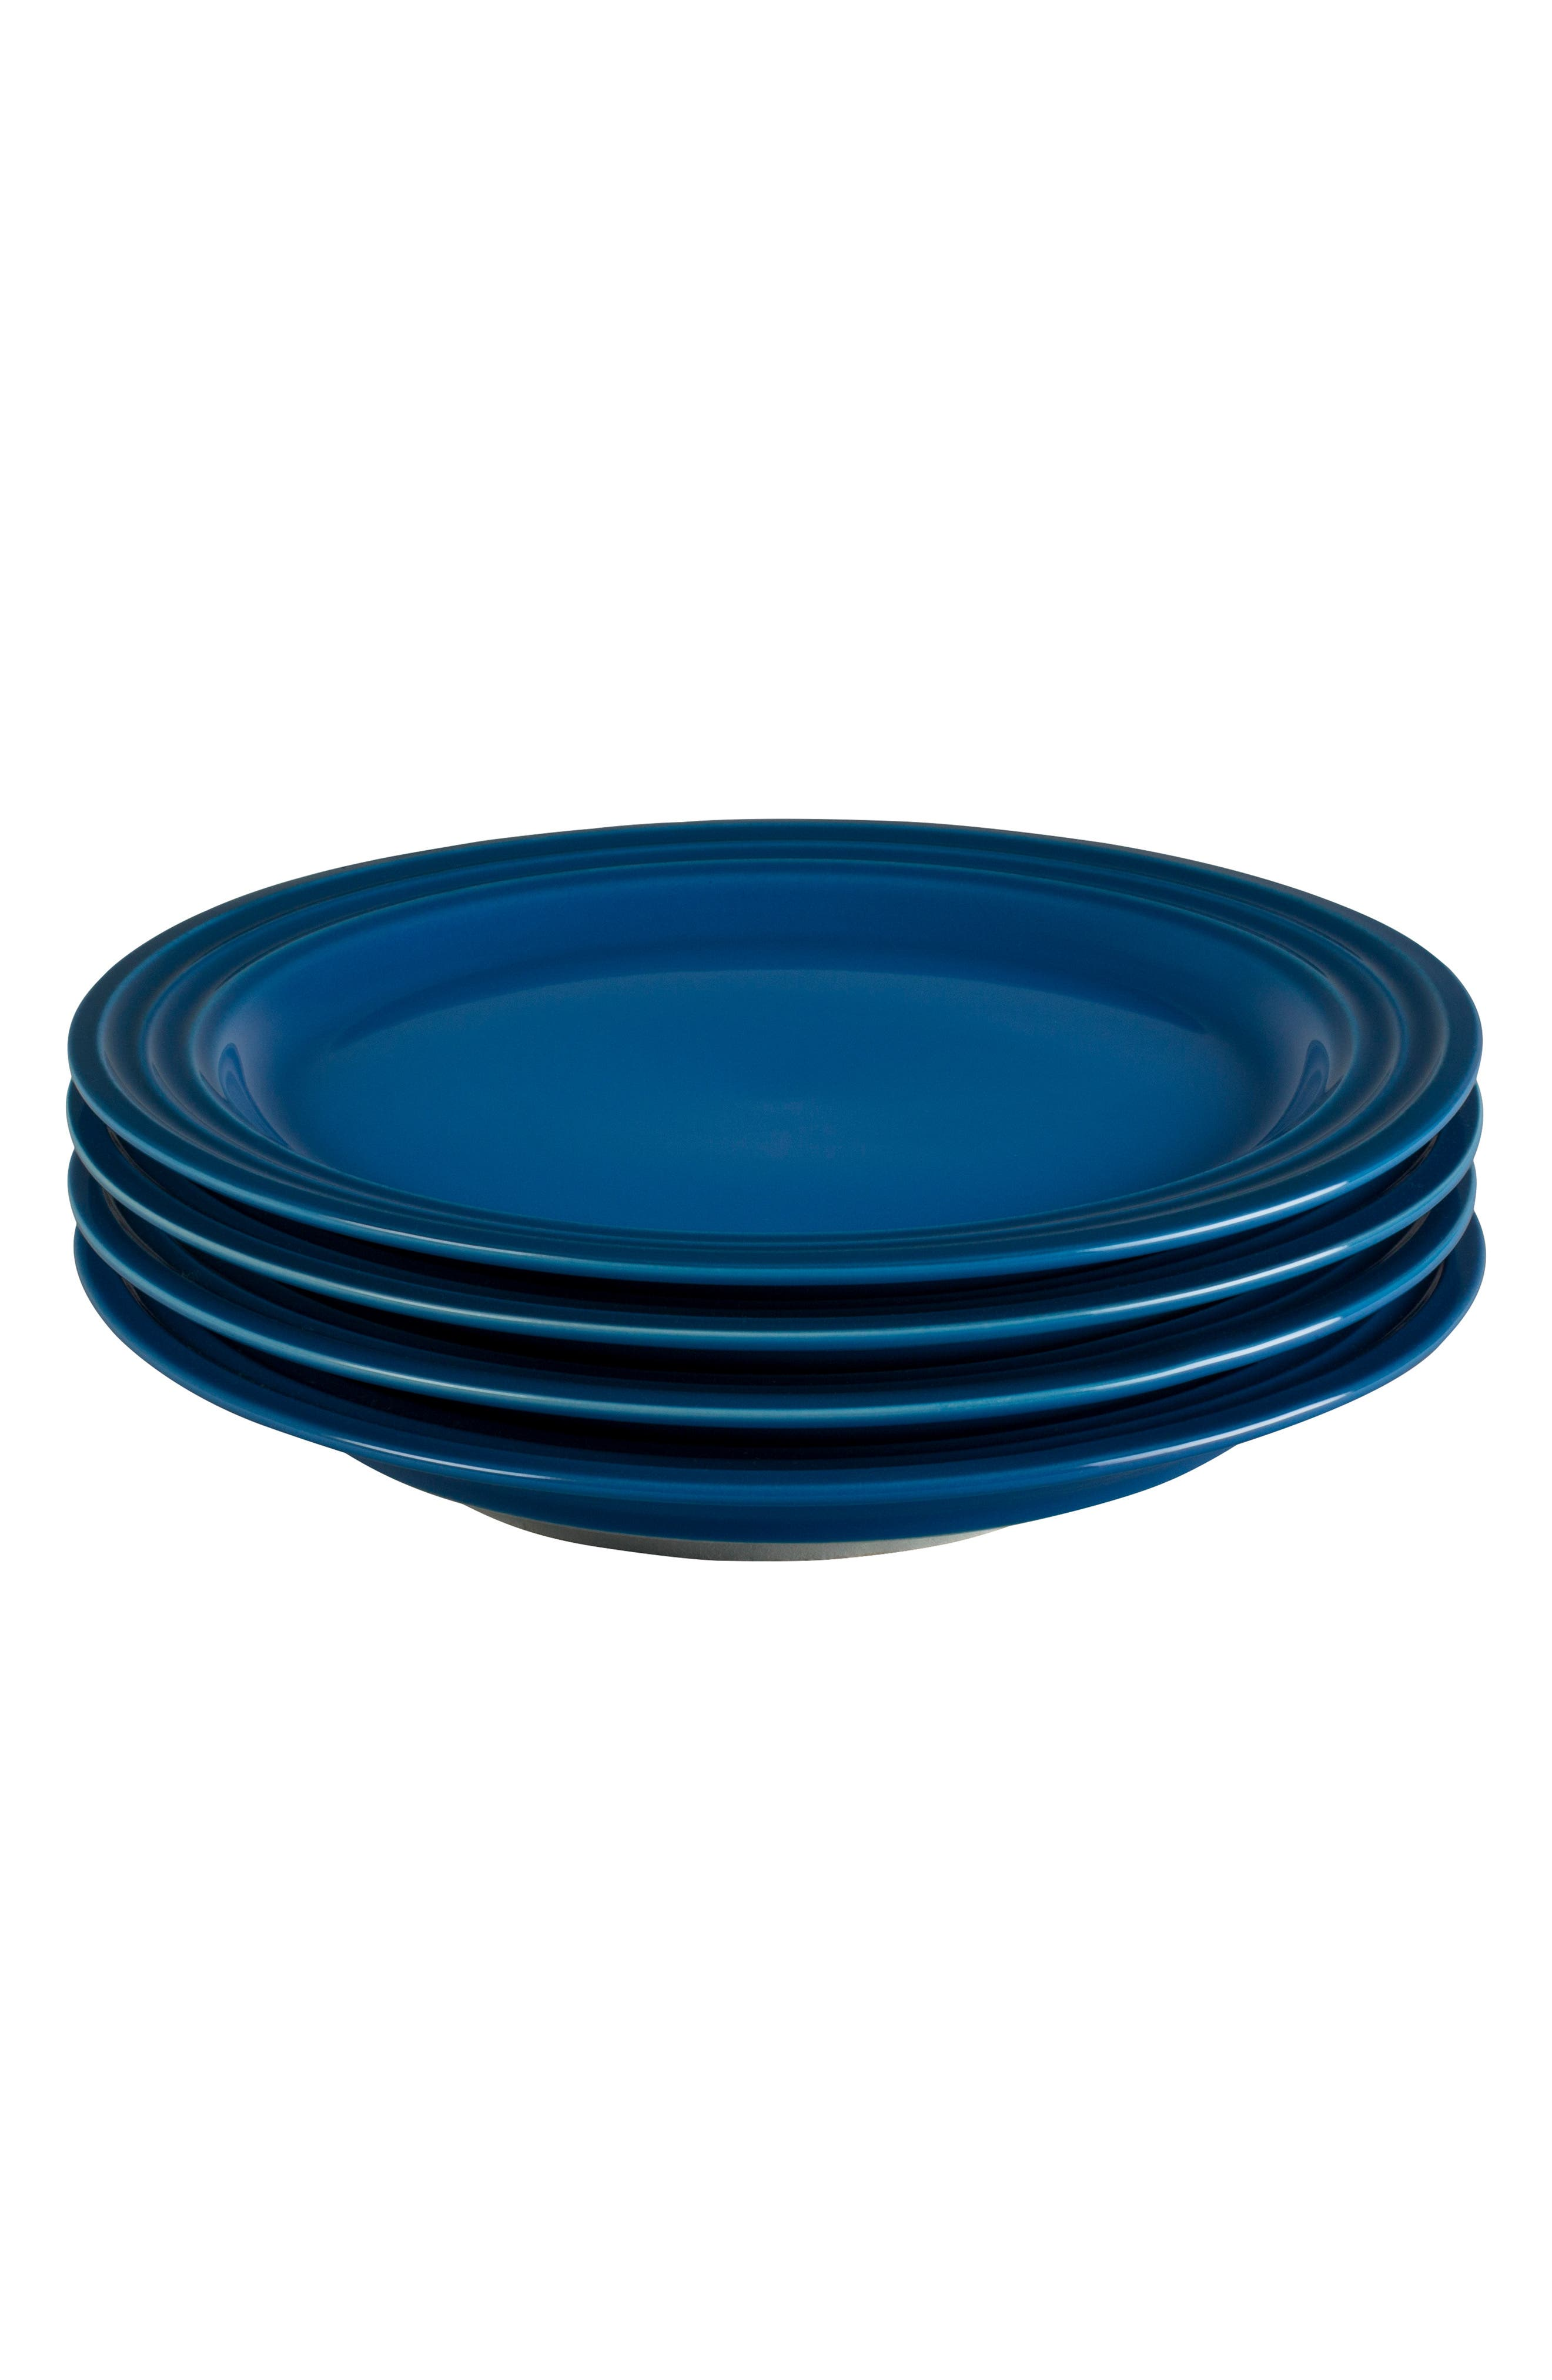 Le Creuset Set Of 4 8 12Inch Salad Plates Size One Size  Blue